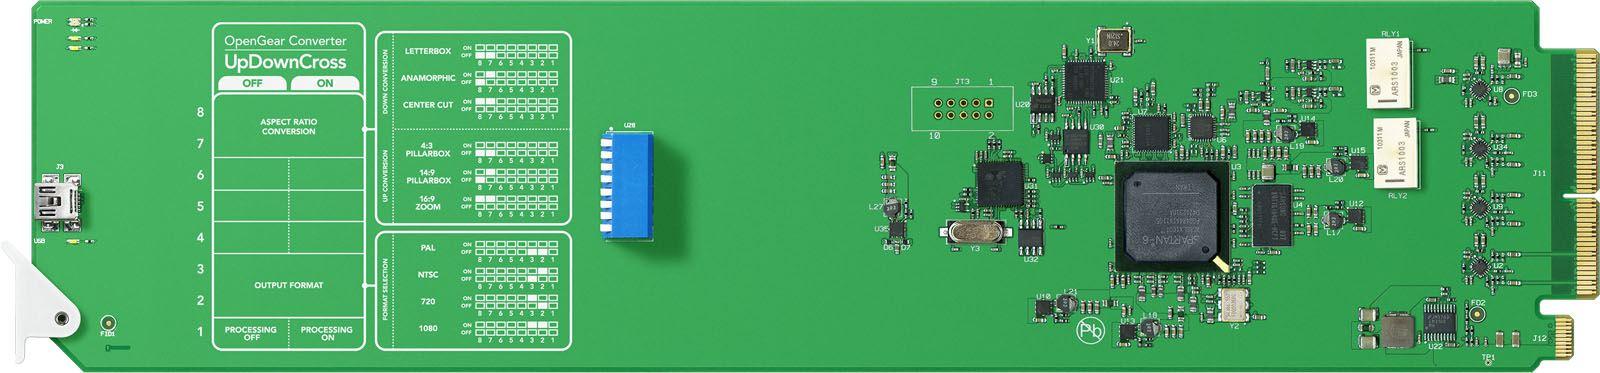 Blackmagic Design Opengear Converters Opengear Sdi To Analog Hdmi To Sdi Opengear Optical Fiber And More